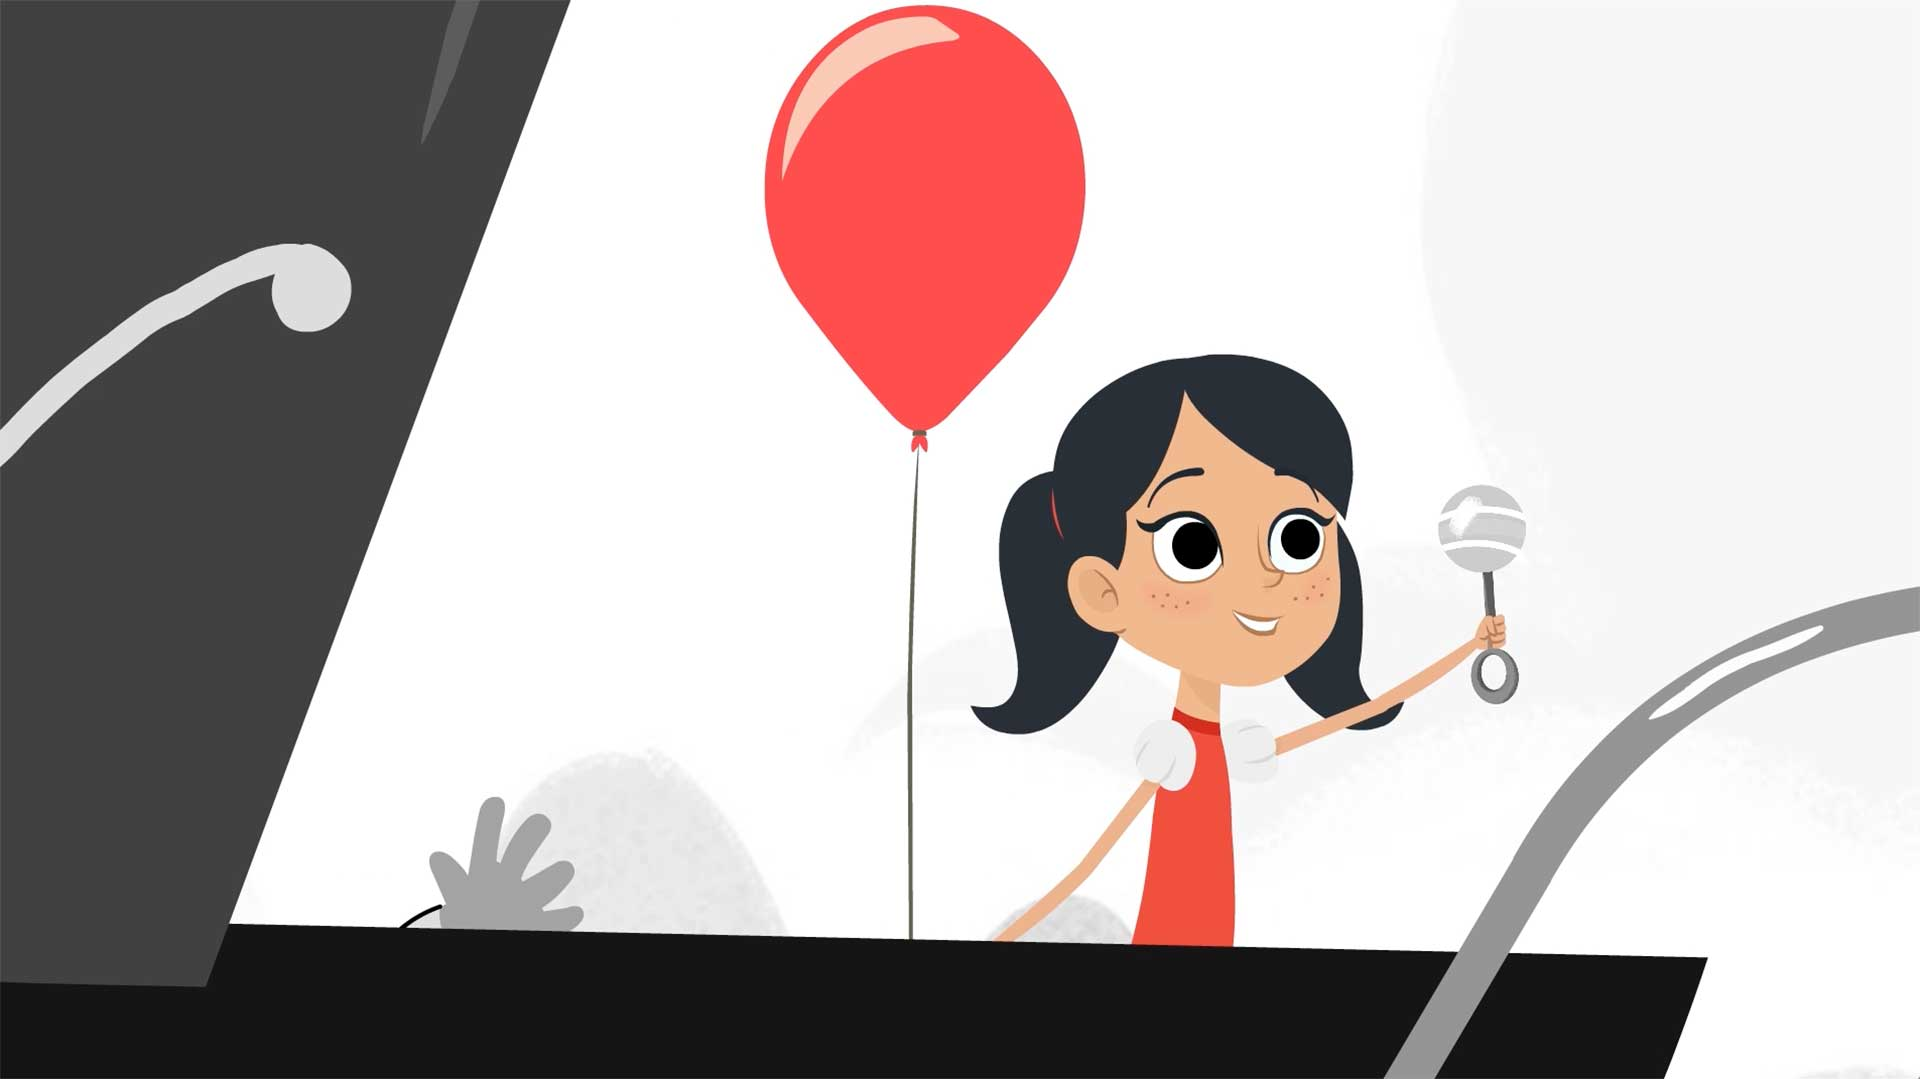 Watch Balloon Girl